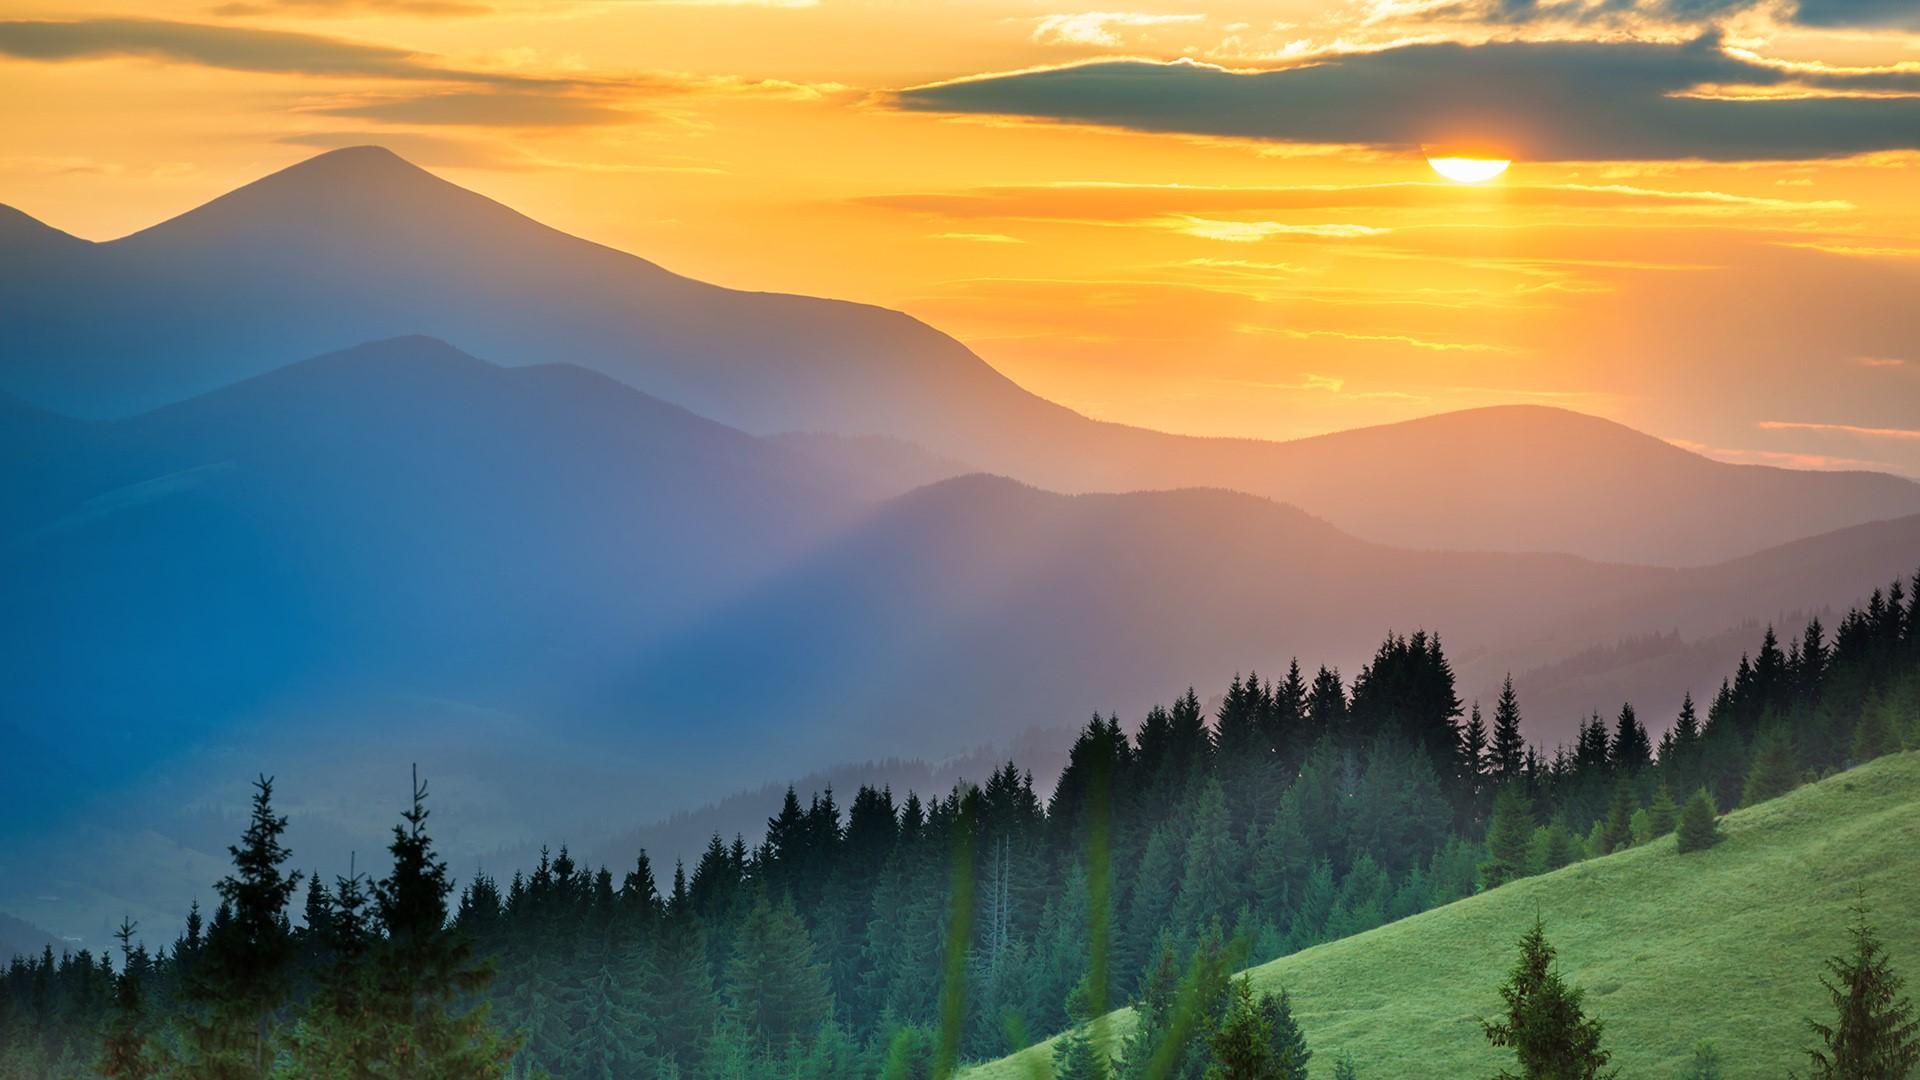 General 1920x1080 nature landscape trees forest grass mountains mist clouds sky Sun sunset